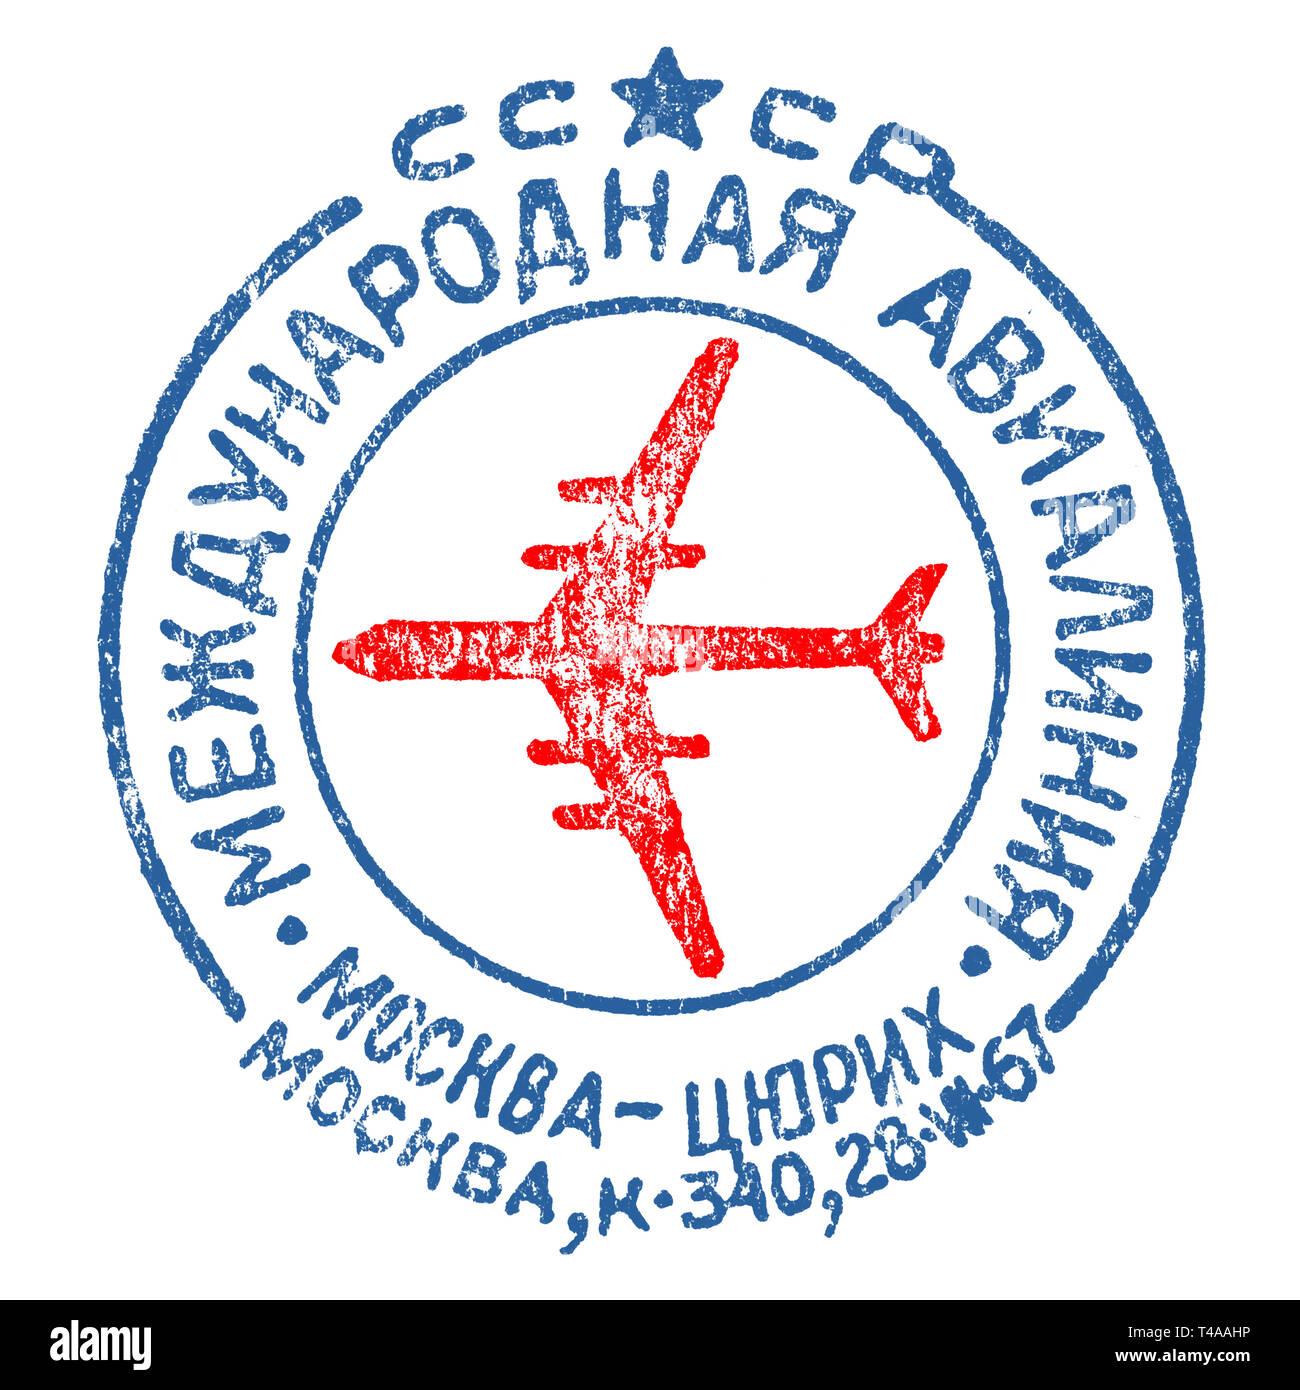 Vintage USSR postage meter stamp - Stock Image